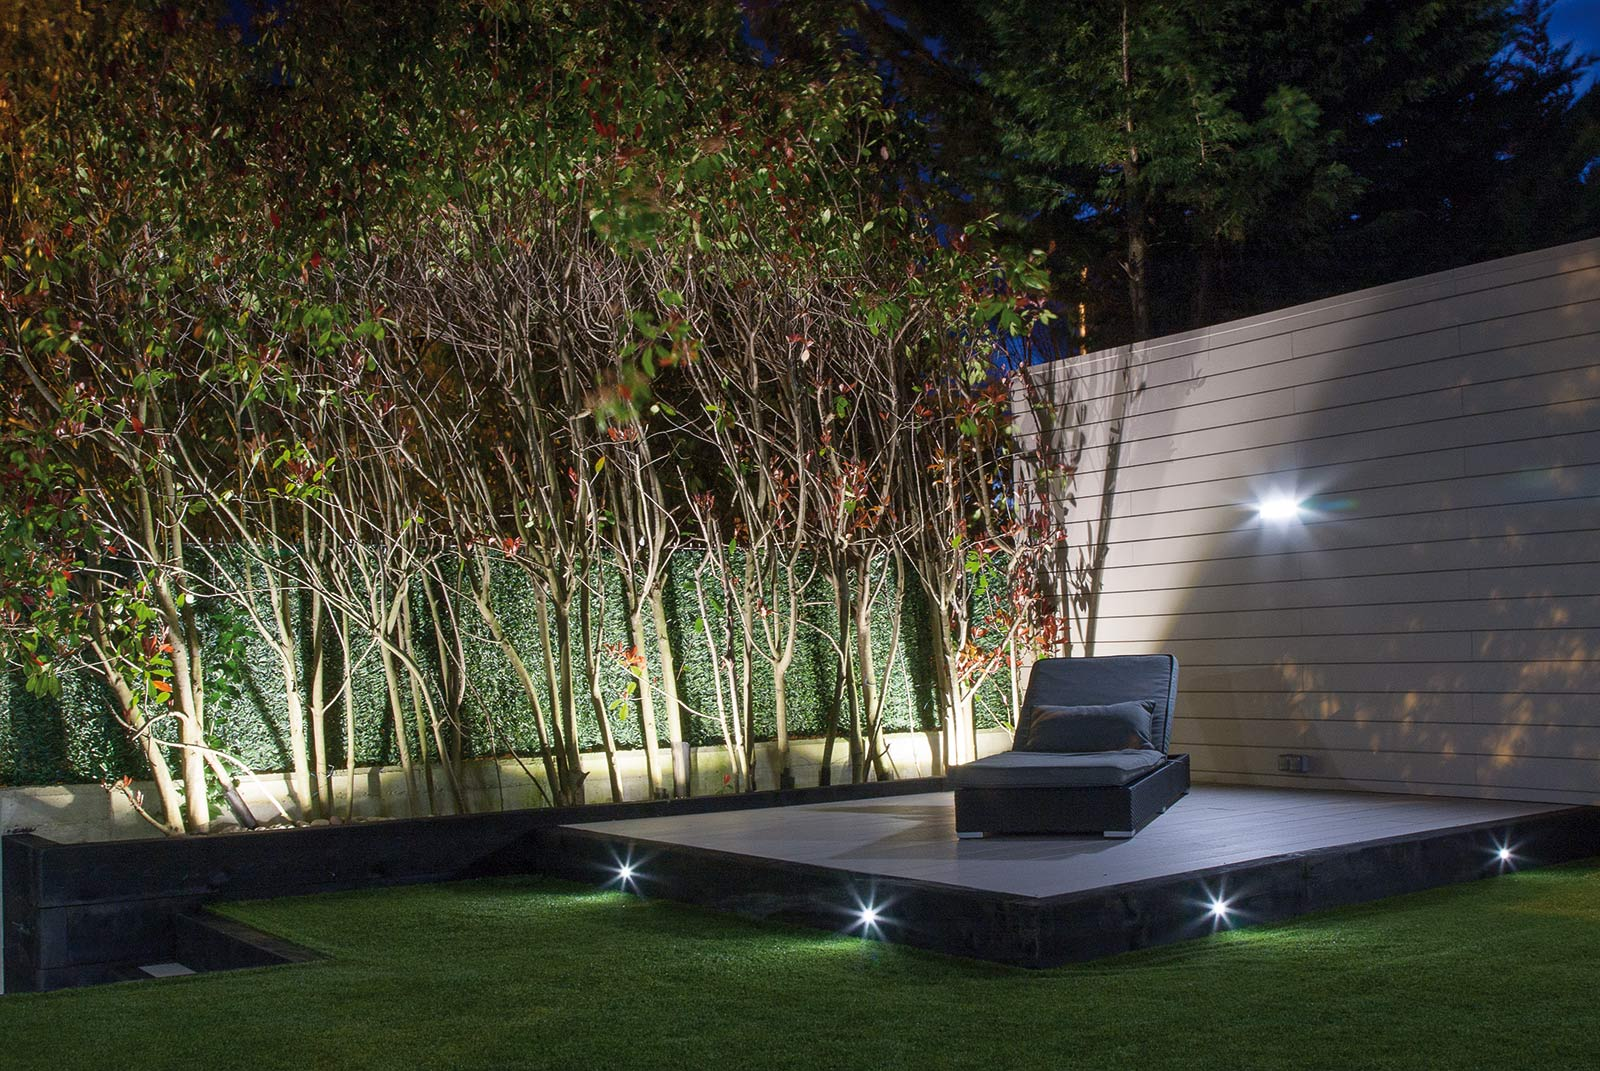 Jard n con iluminaci n proyectos echarri - Iluminacion de jardines ...